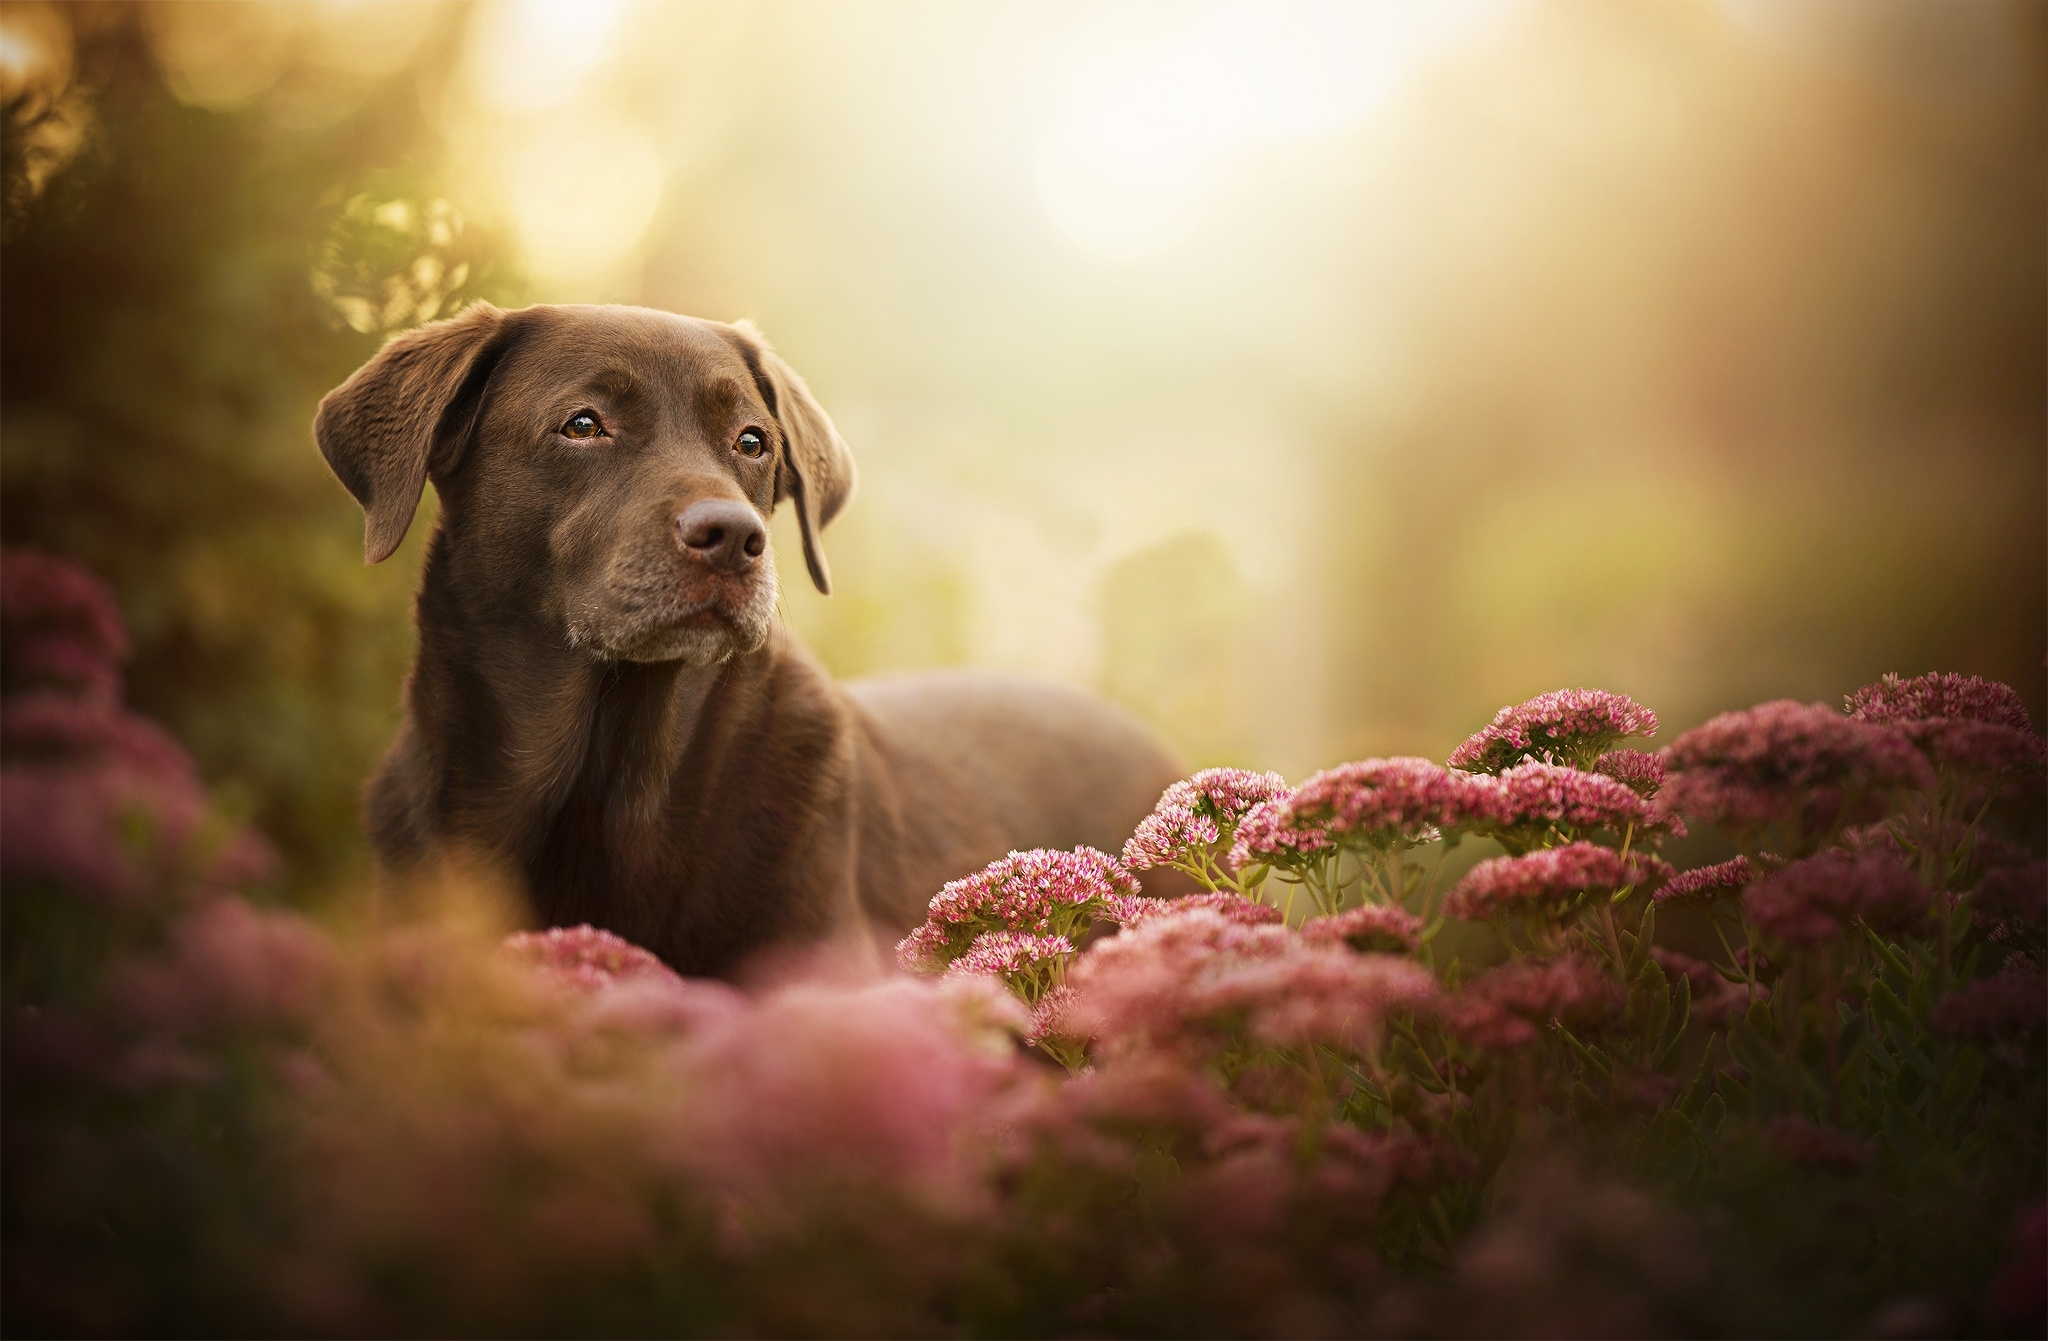 Best Food For Puppies >> Labrador Retriever Dog, Full HD 2K Wallpaper